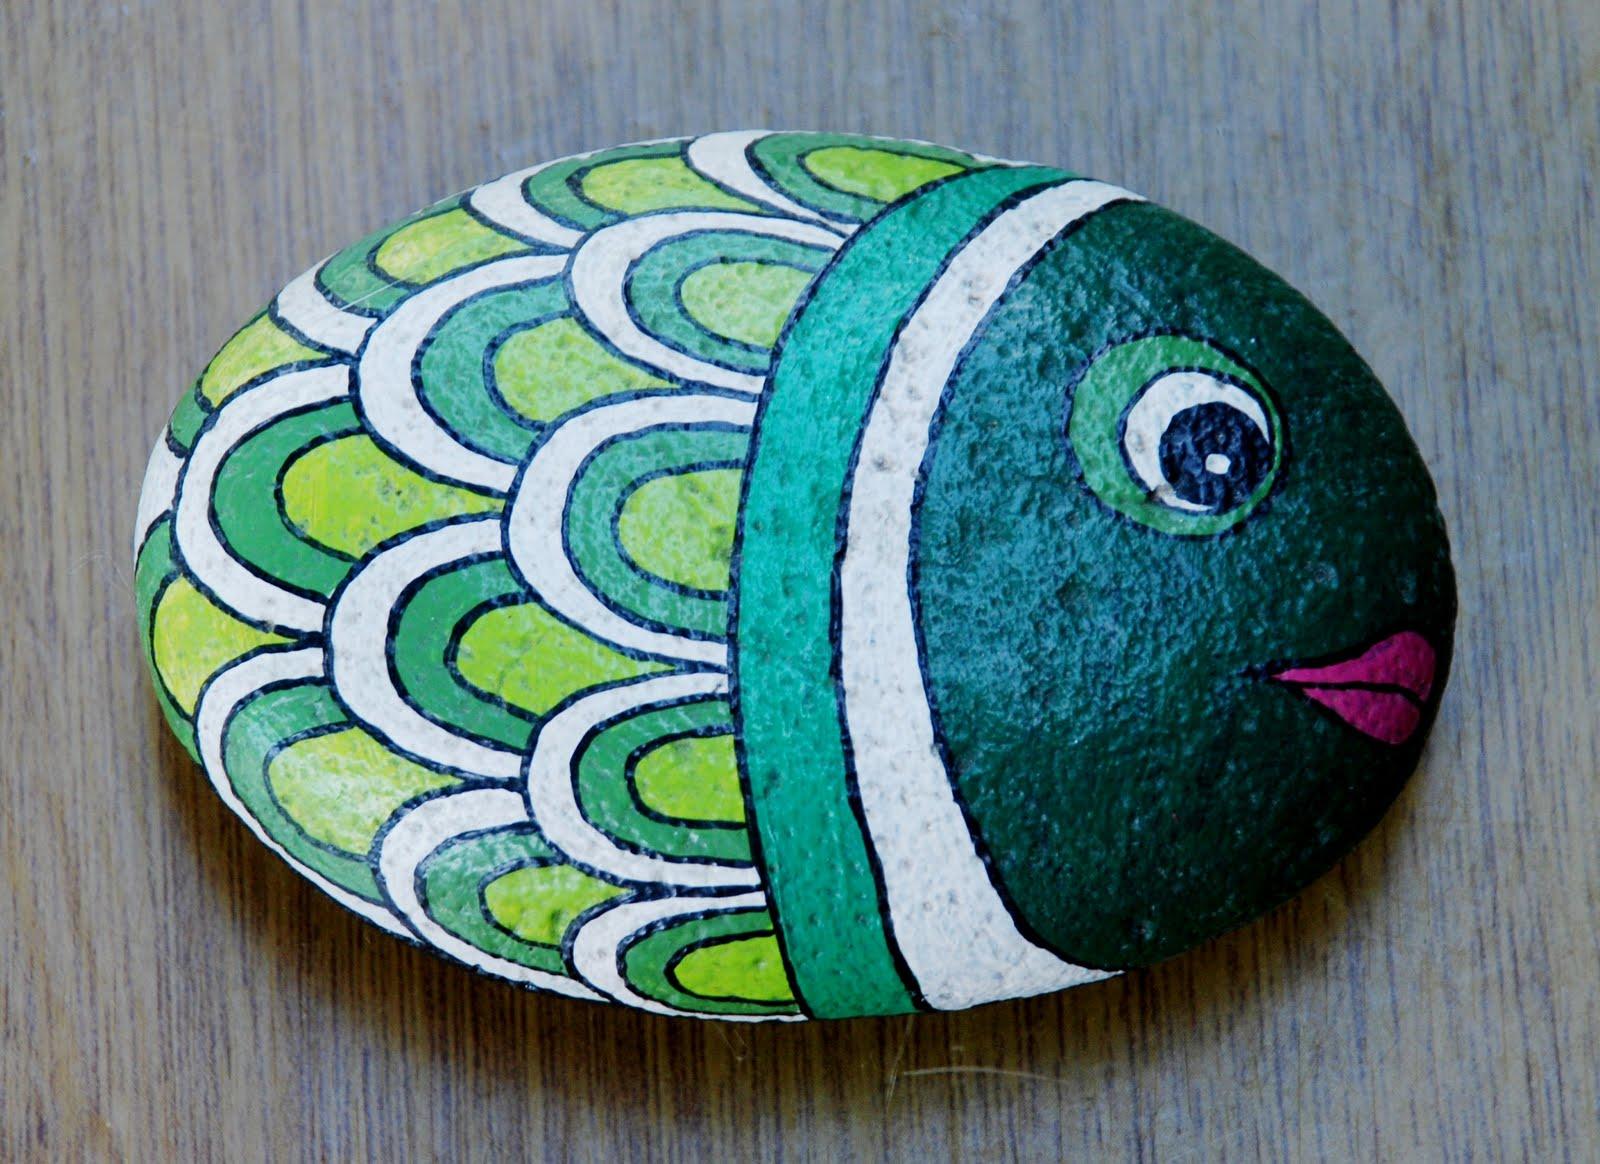 Artesanias yibi piedras pintadas for Como pintar piedras